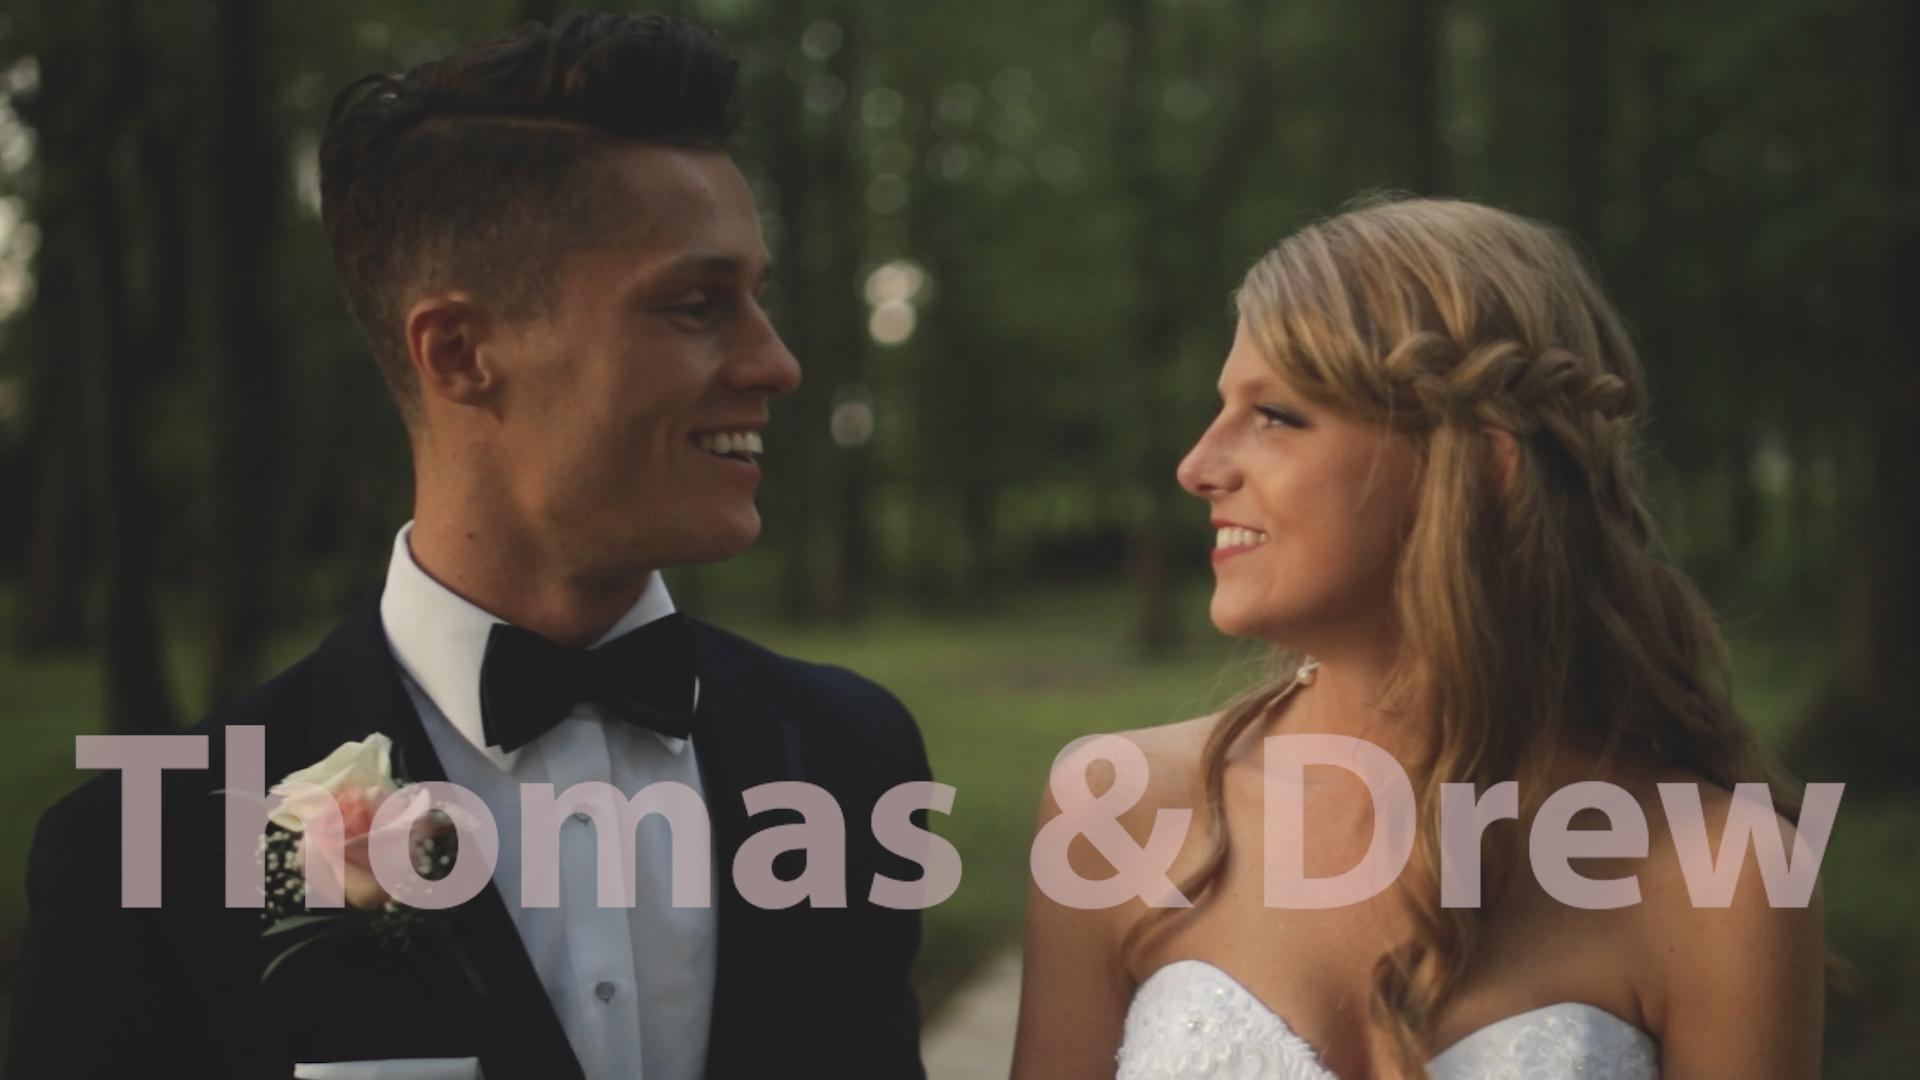 Thomas + Drew | Sonora, Kentucky | Thurman Landing